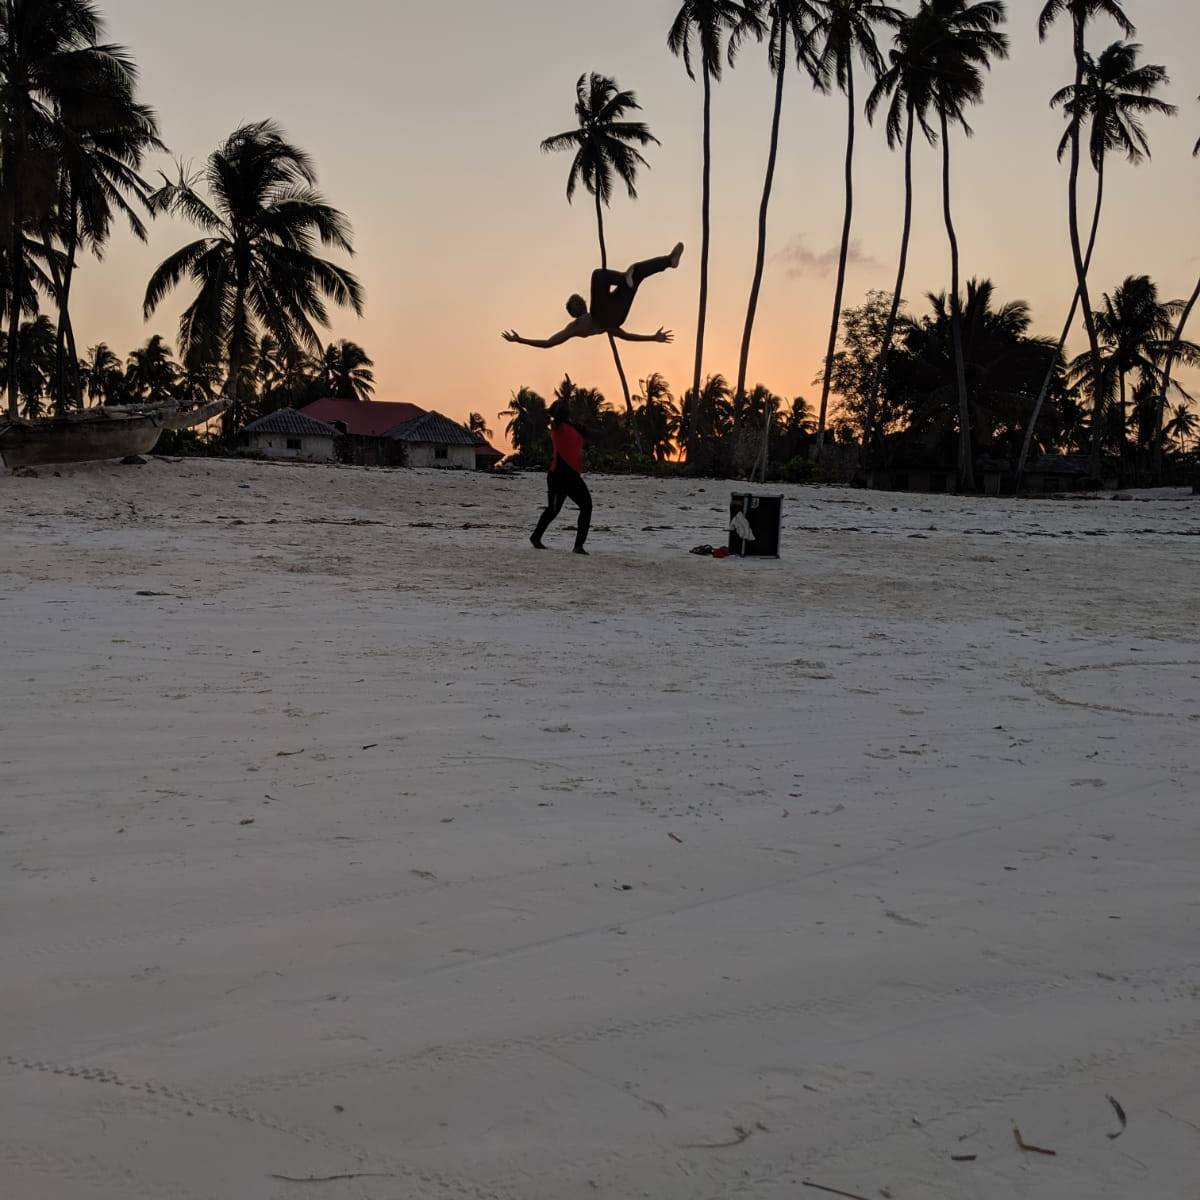 People training an acrobatic routine at sunset on Jambiani Beach, Zanzibar